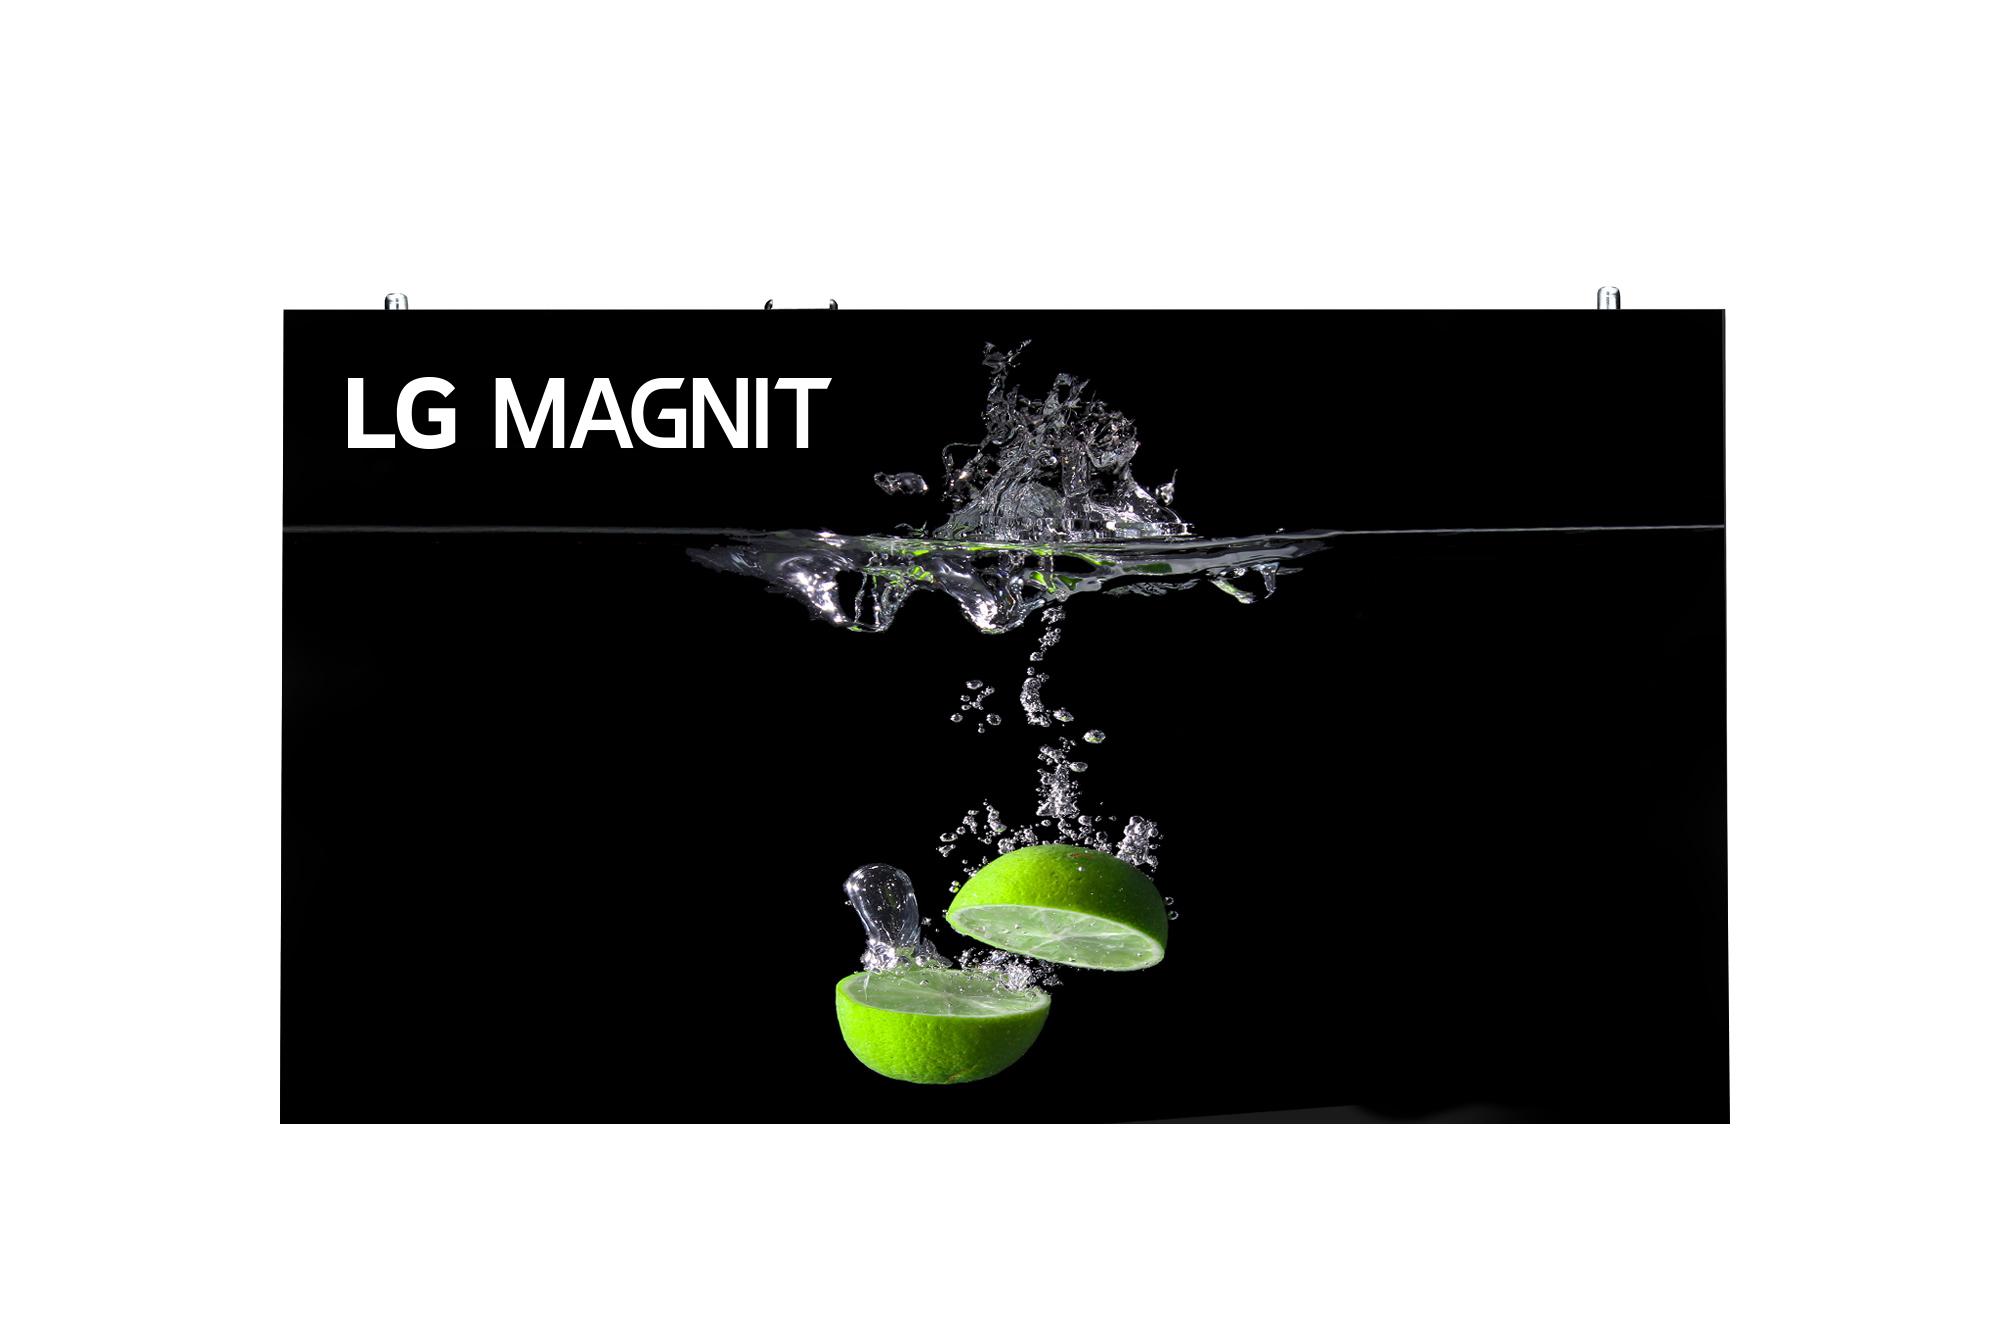 LG LG MAGNIT LSAB009